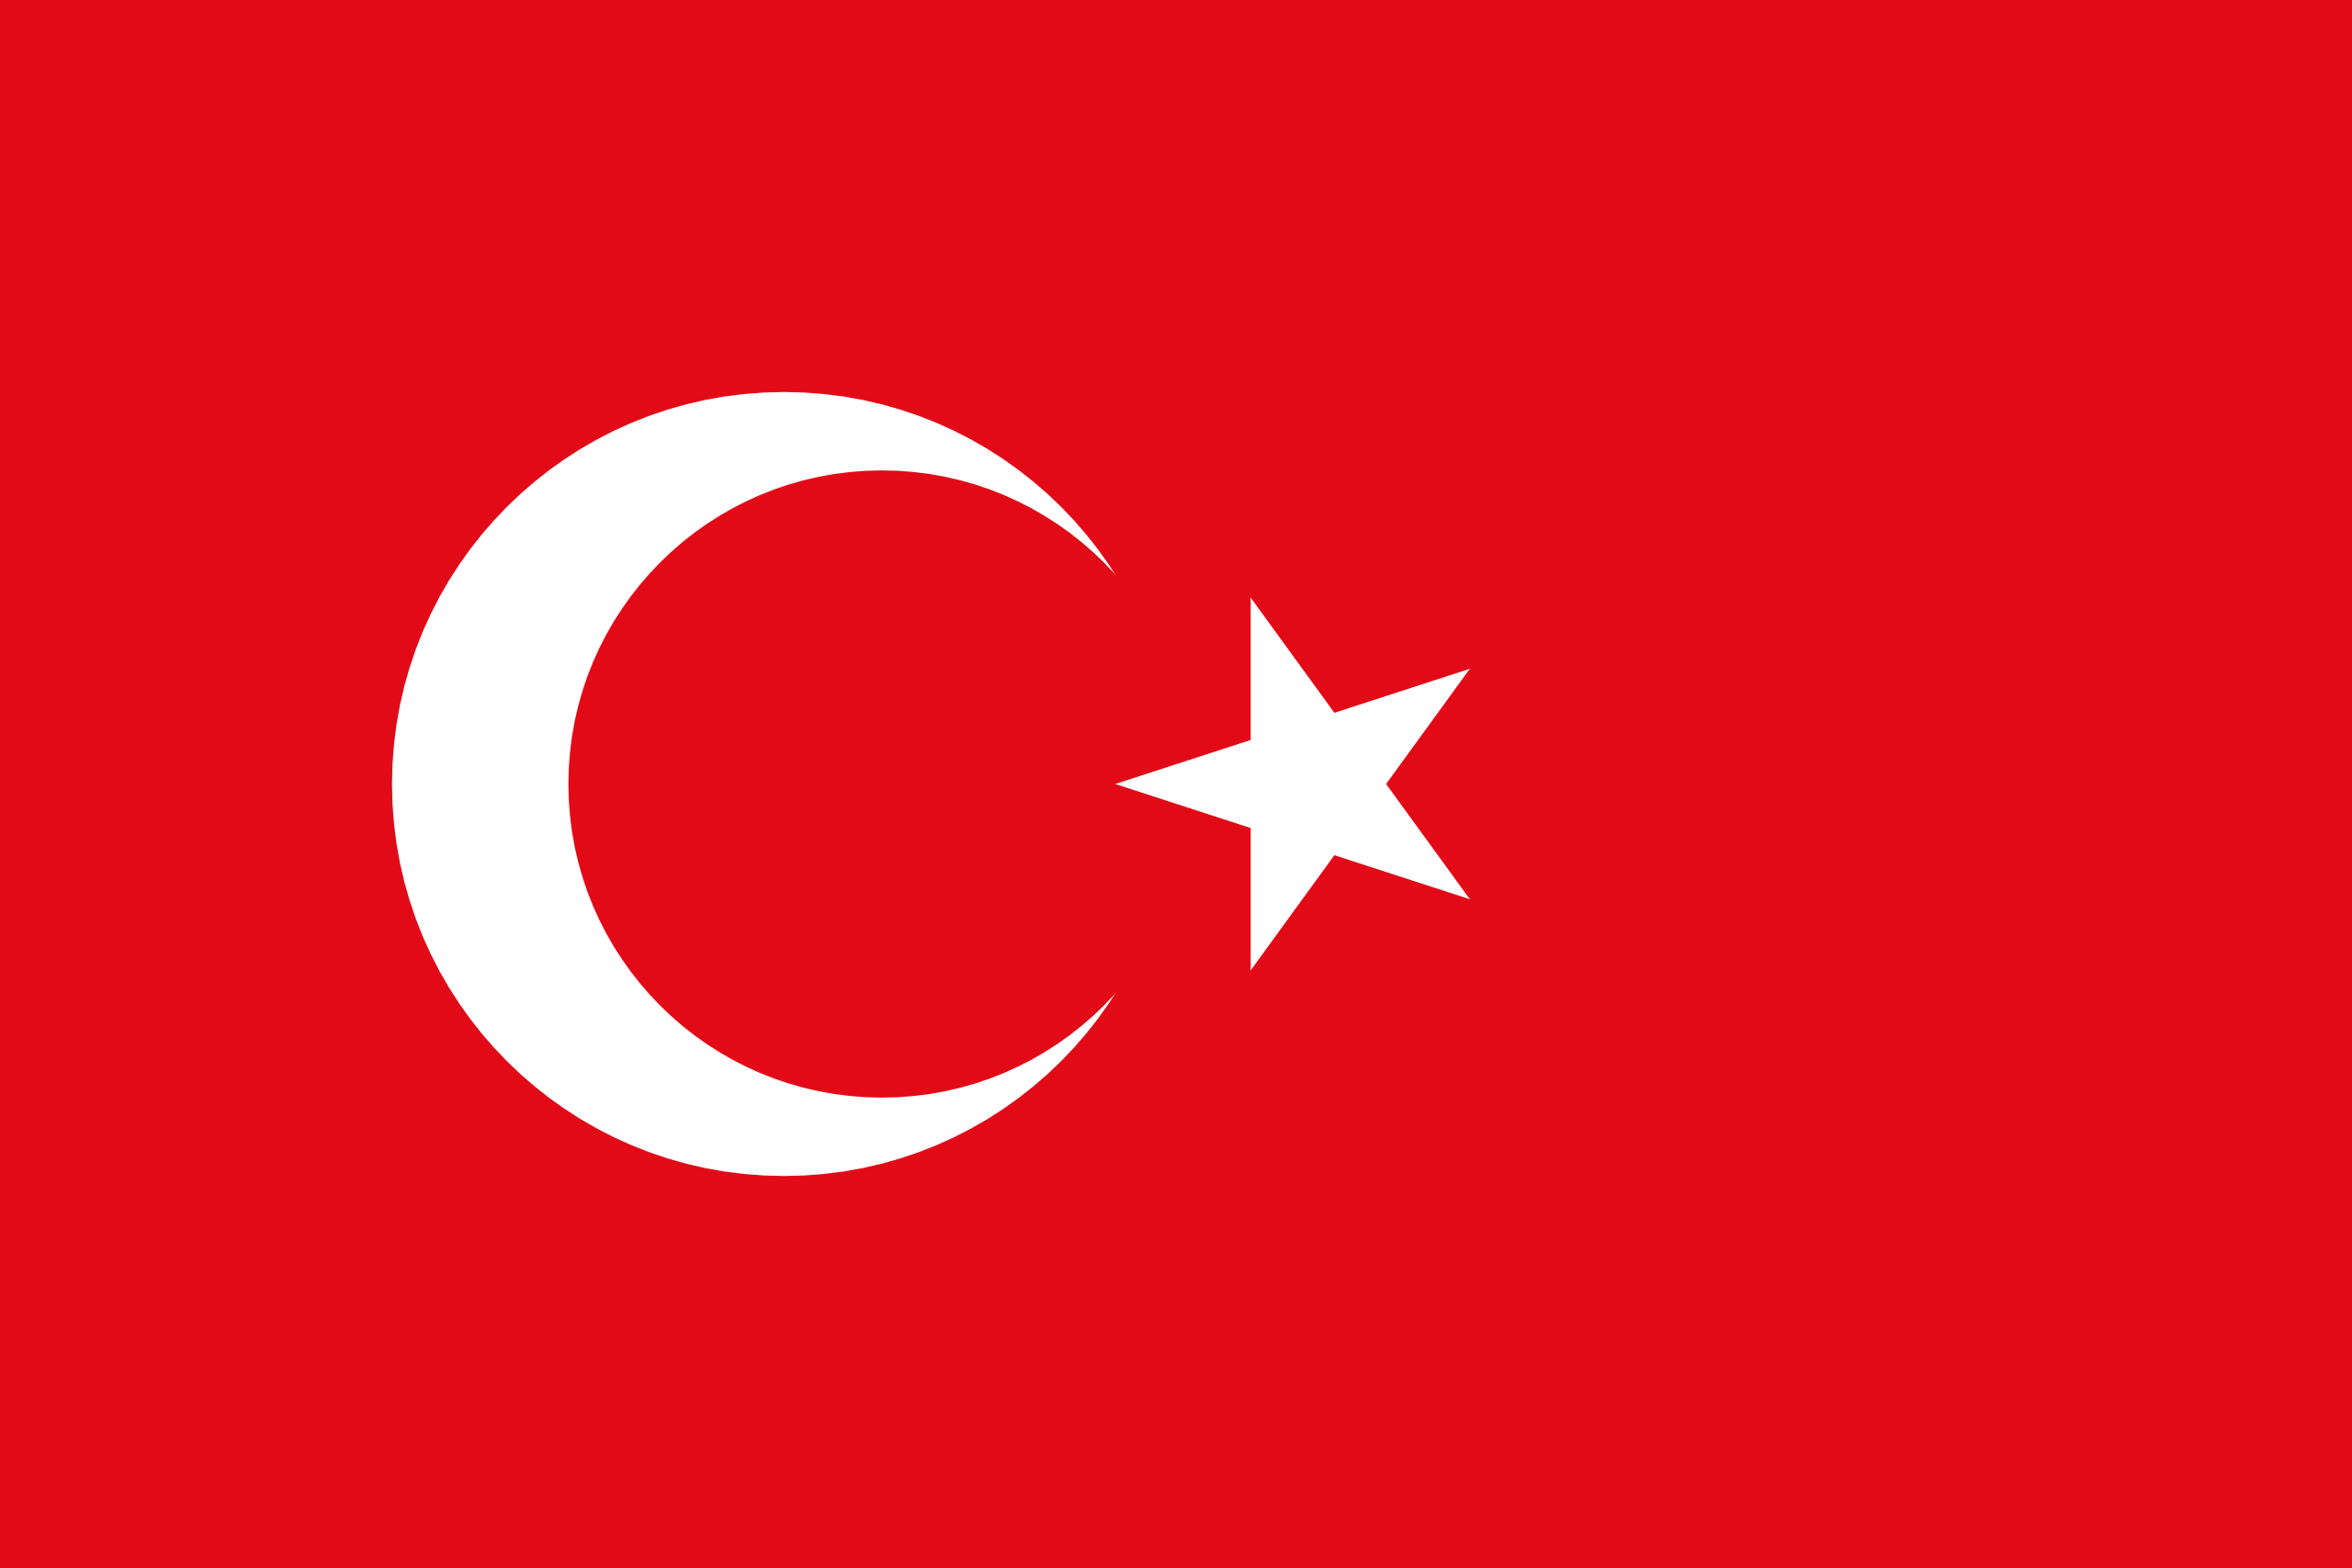 Turquie, pays, emblème, logo, symbole - Fonds d'écran HD - Professor-falken.com